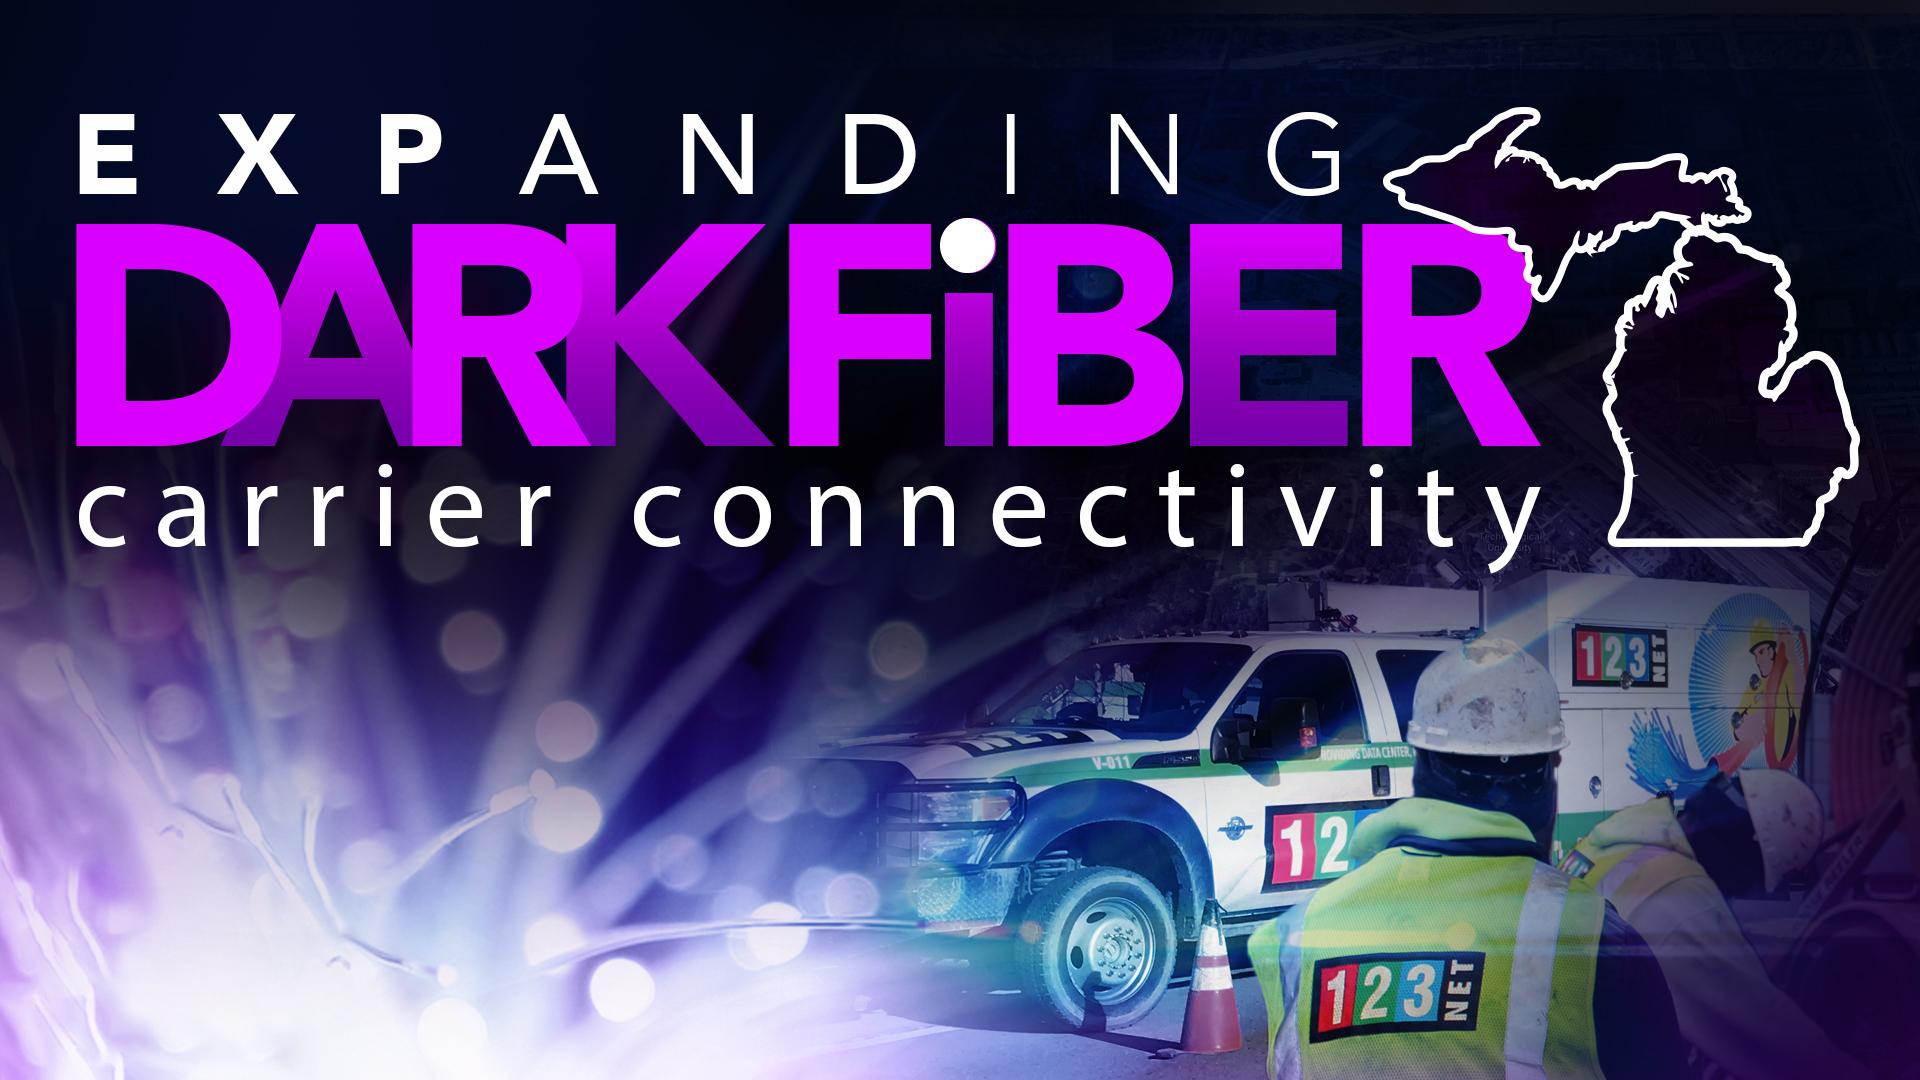 Expanding Dark Fiber Carrier Connectivity Into Novi, Canton & Warren